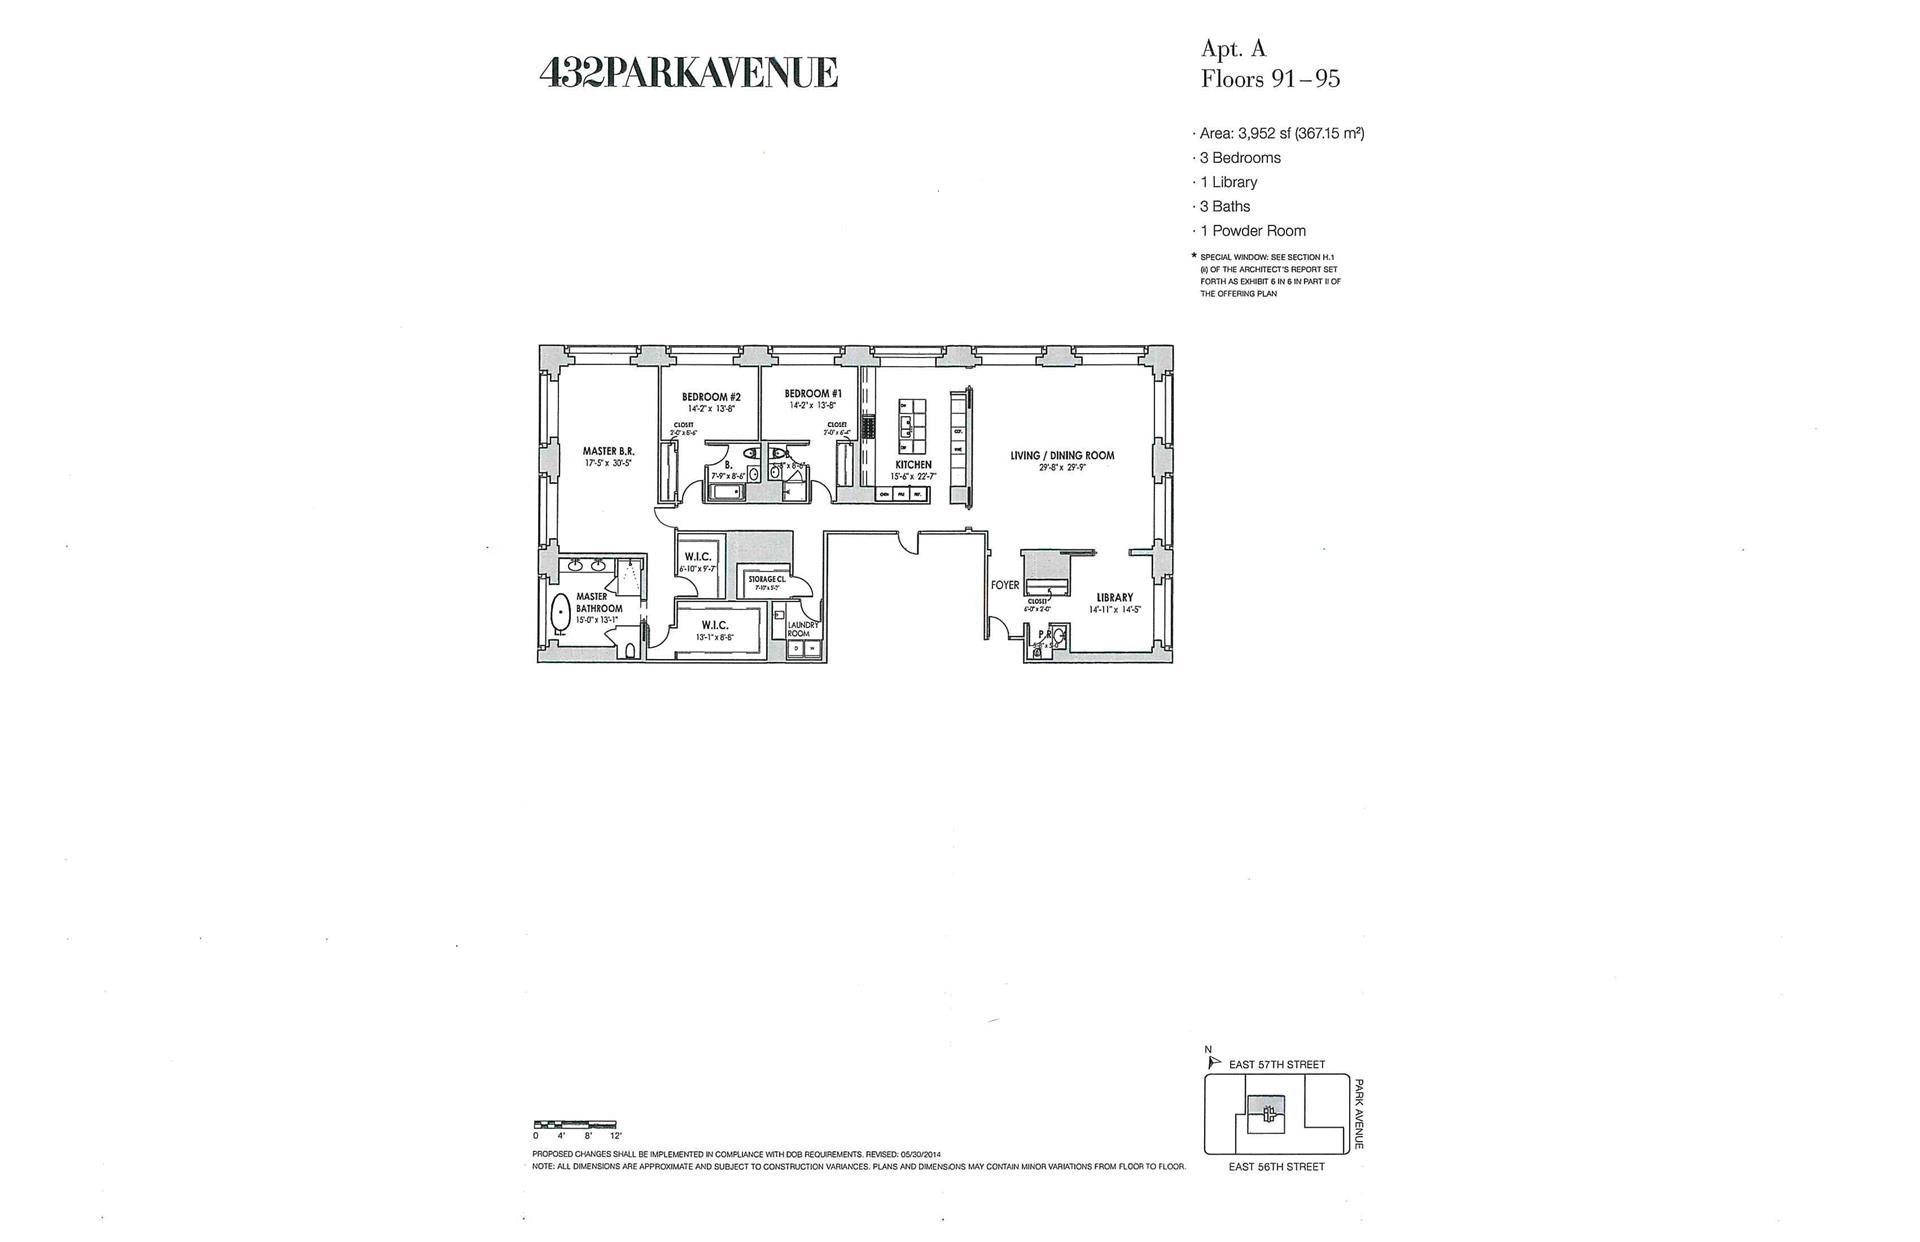 Floor plan of 432 Park Avenue, 95A - Midtown, New York